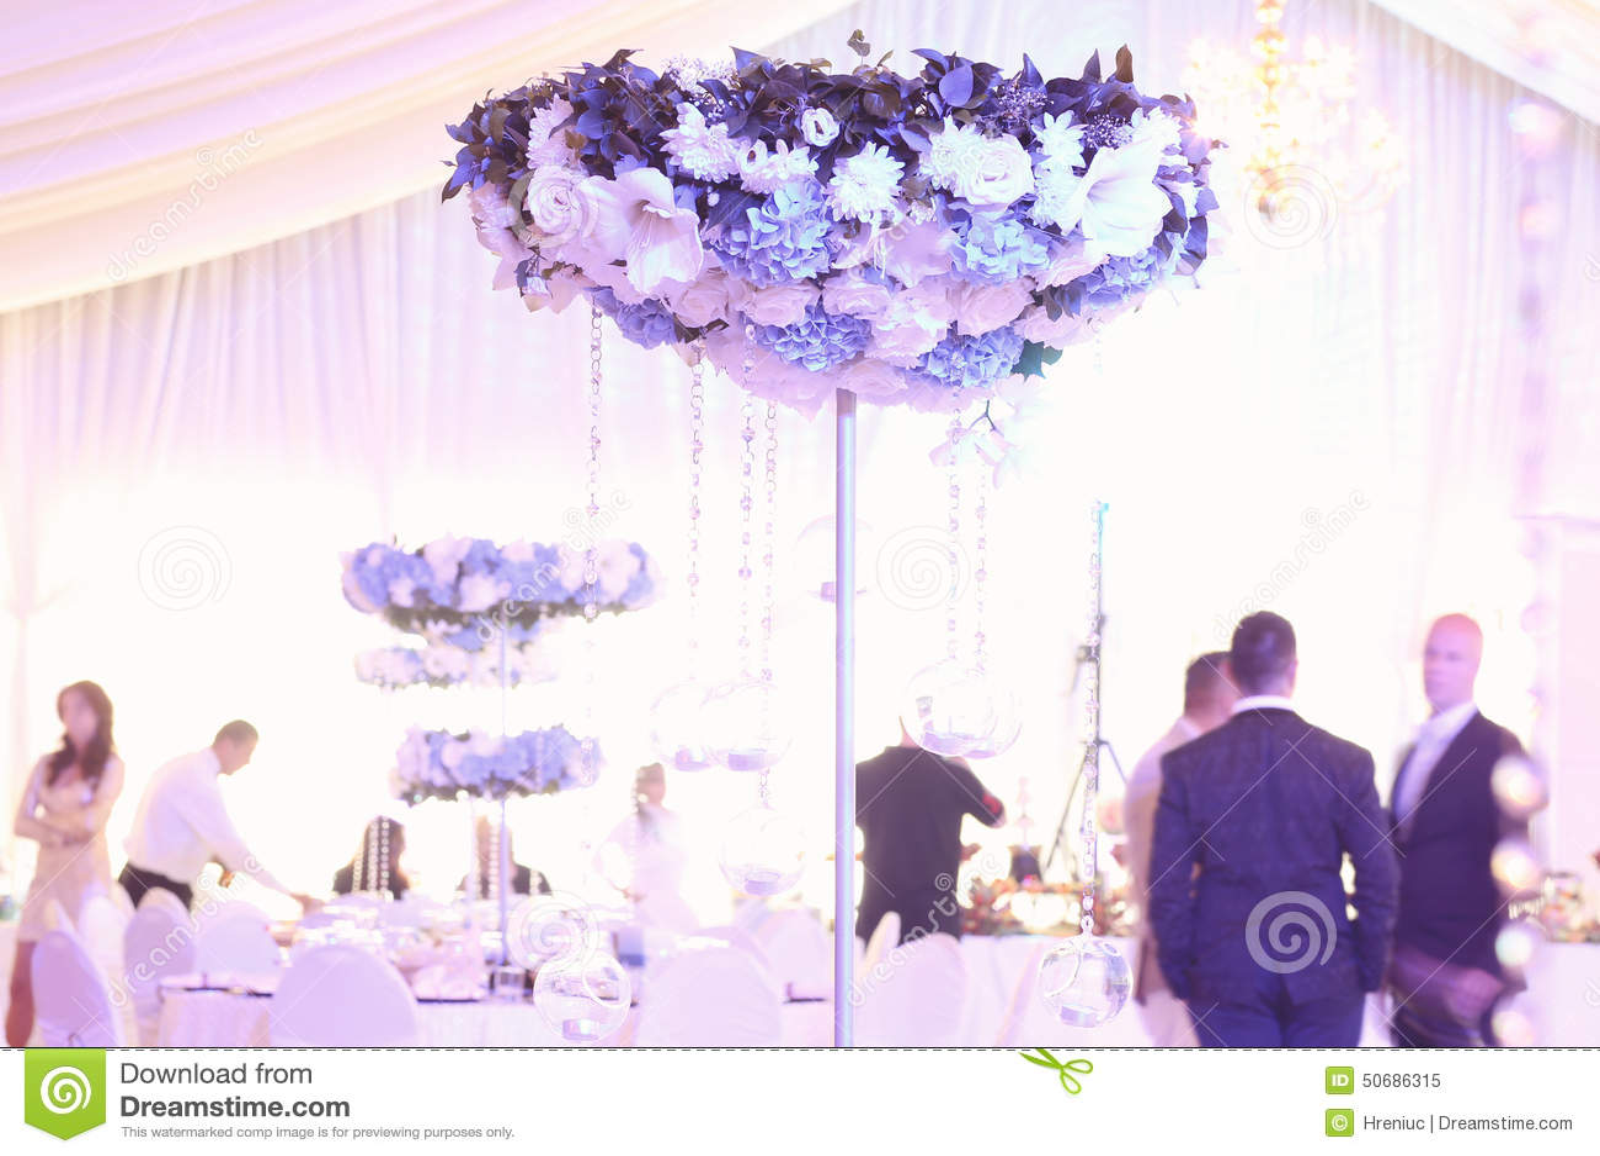 Download 婚礼装饰花 库存图片. 图片 包括有 典雅, 装饰, 干净, 洗礼, 黑暗, 理想, 陶器, 刀叉餐具, 花梢 - 50686315